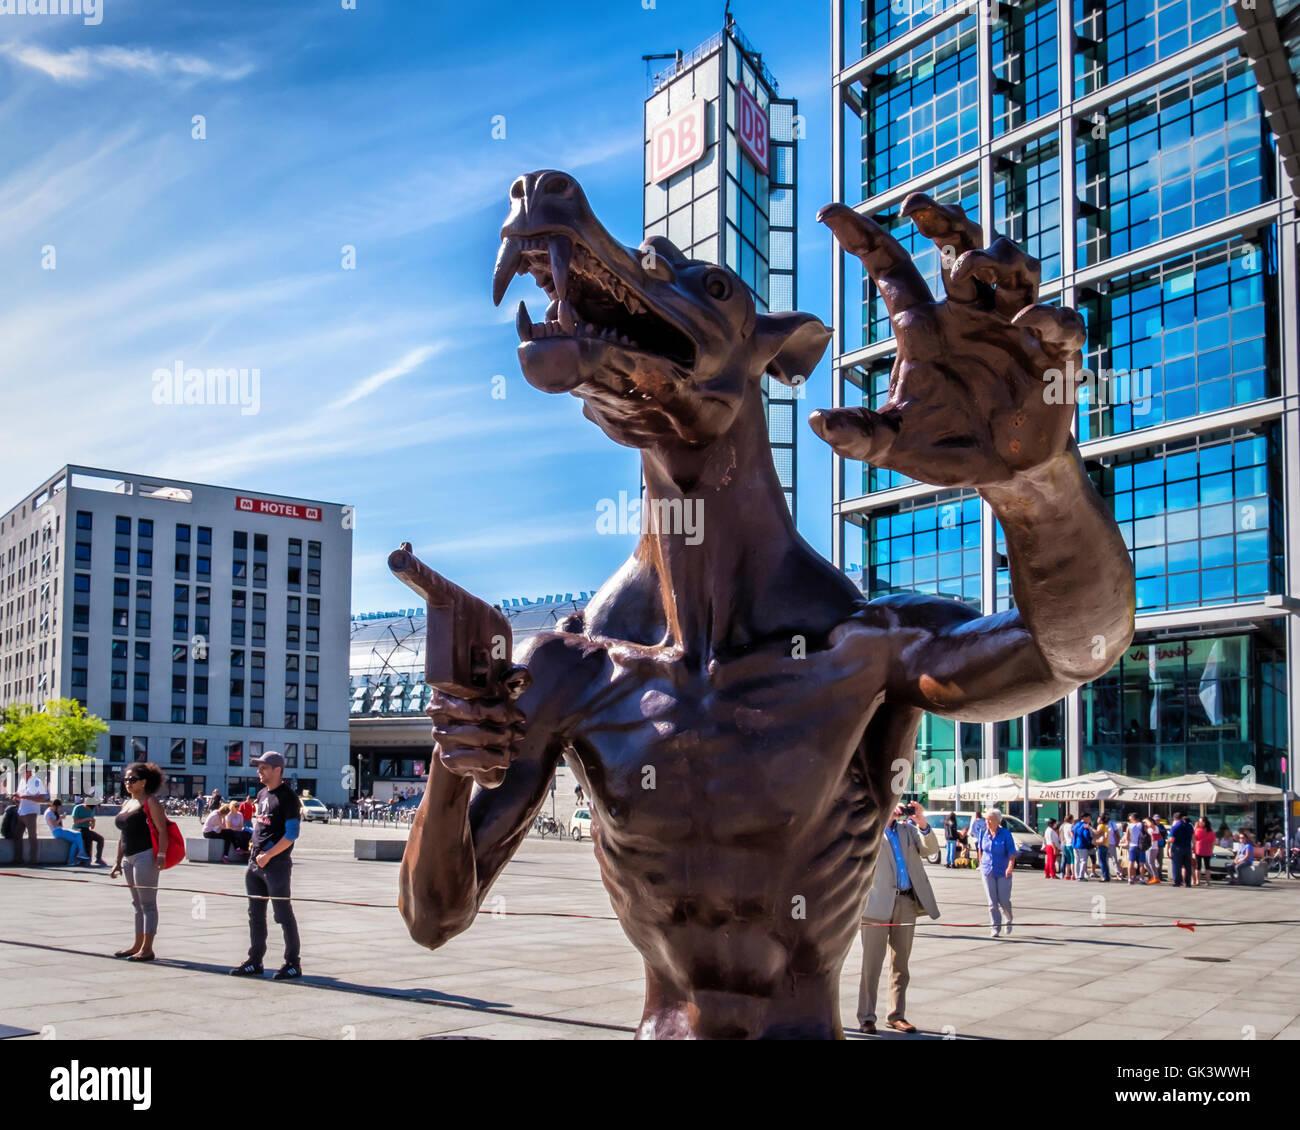 Berlin Haupbahnhof. Artist, Rainer Opolka's artwork, Wölfe sind zurück made up of 66 giant bronze wolves - Stock Image